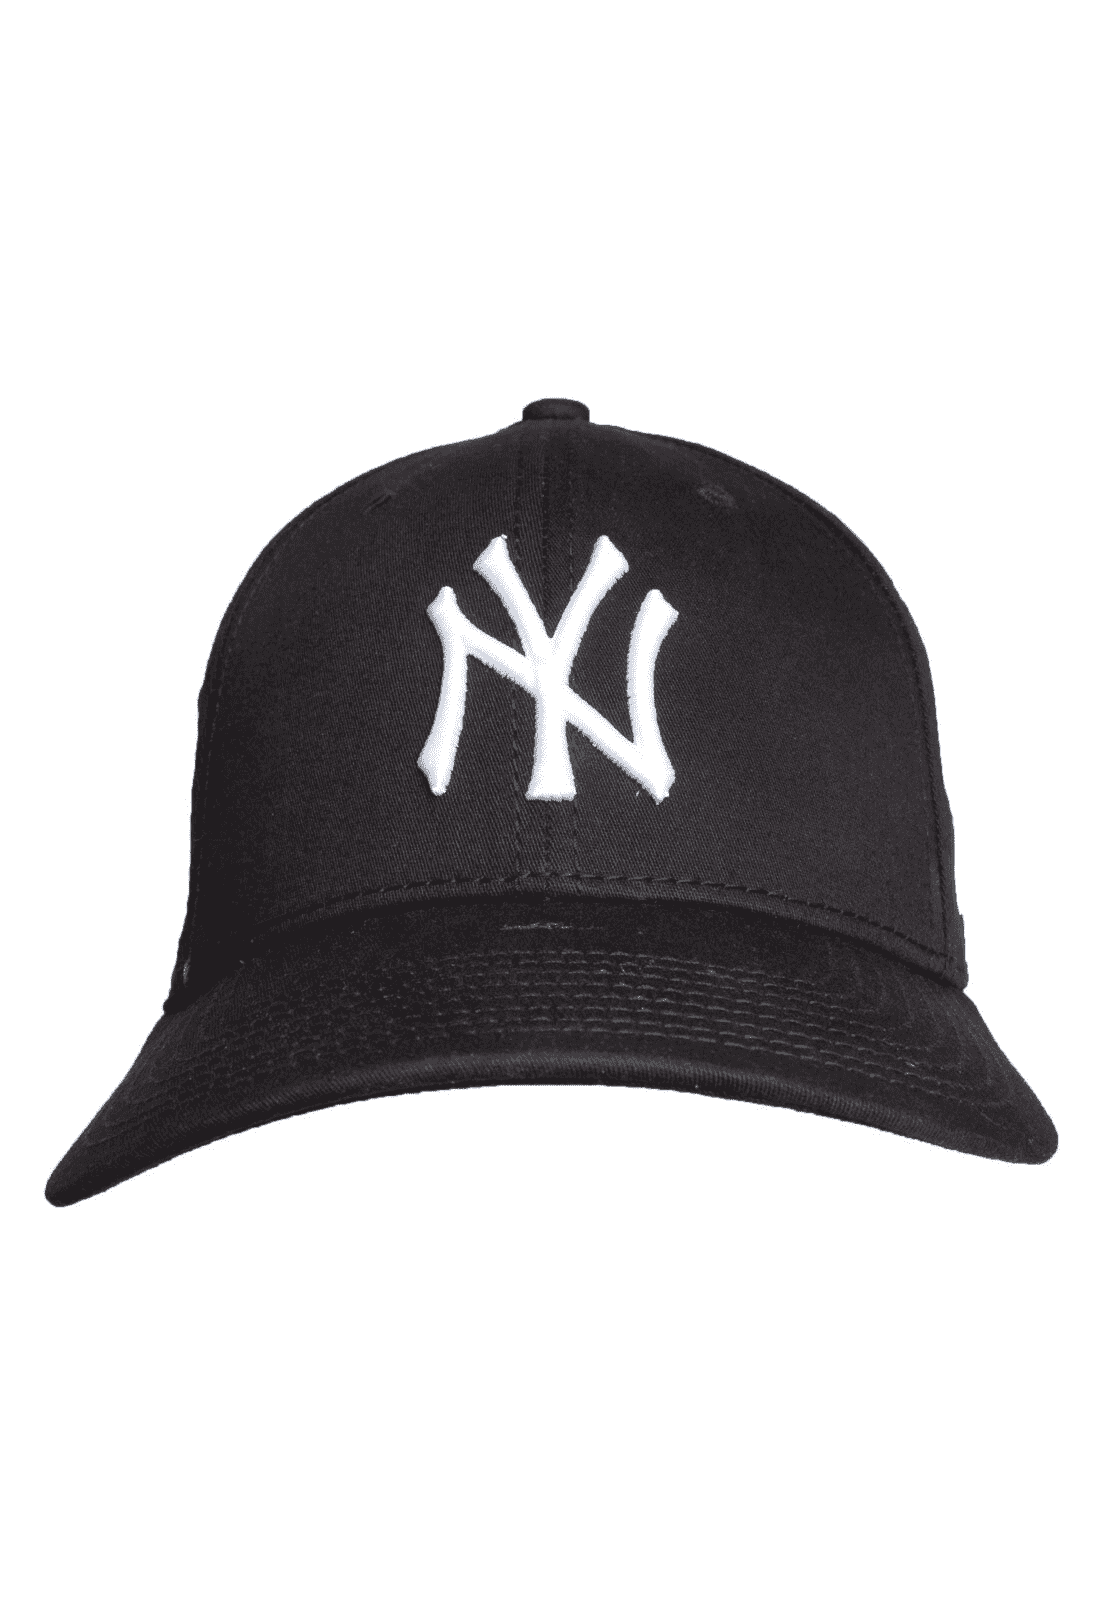 BONÉ 3930 HIGH CROWN MLB NEW YORK YANKEES - PRETO E BRANCO